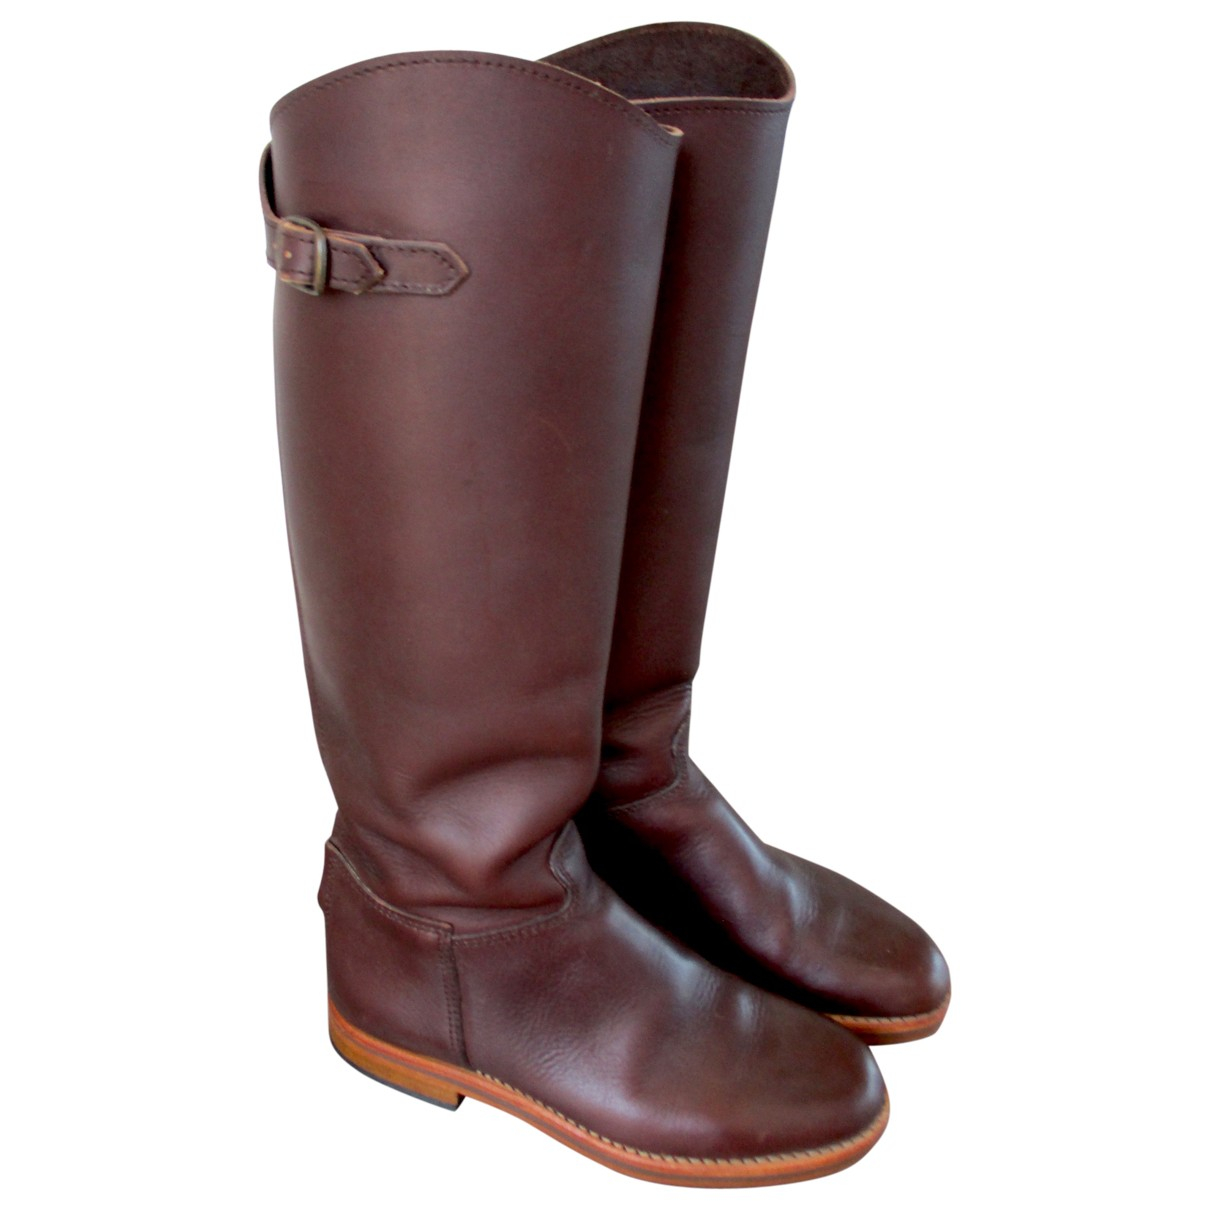 La Botte Gardiane N Brown Leather Boots for Women 35 EU